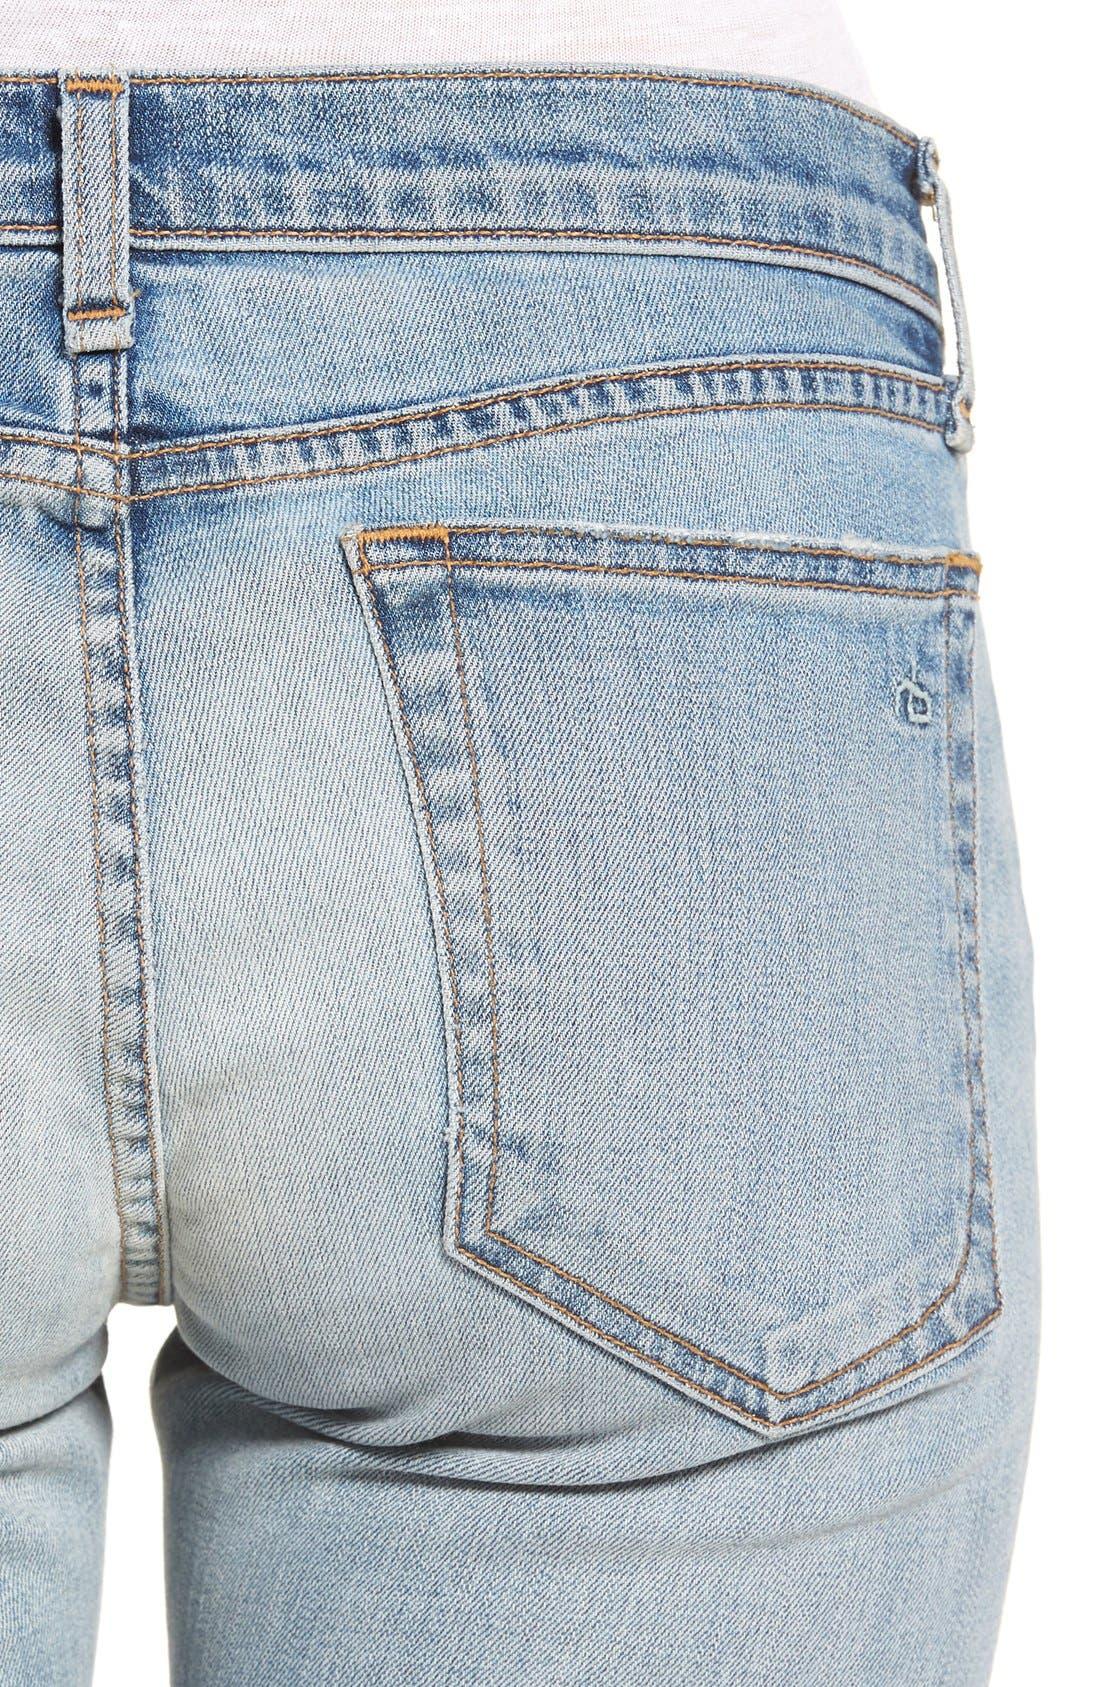 Alternate Image 4  - rag & bone/JEAN 'The Dre' Slim Boyfriend Jeans